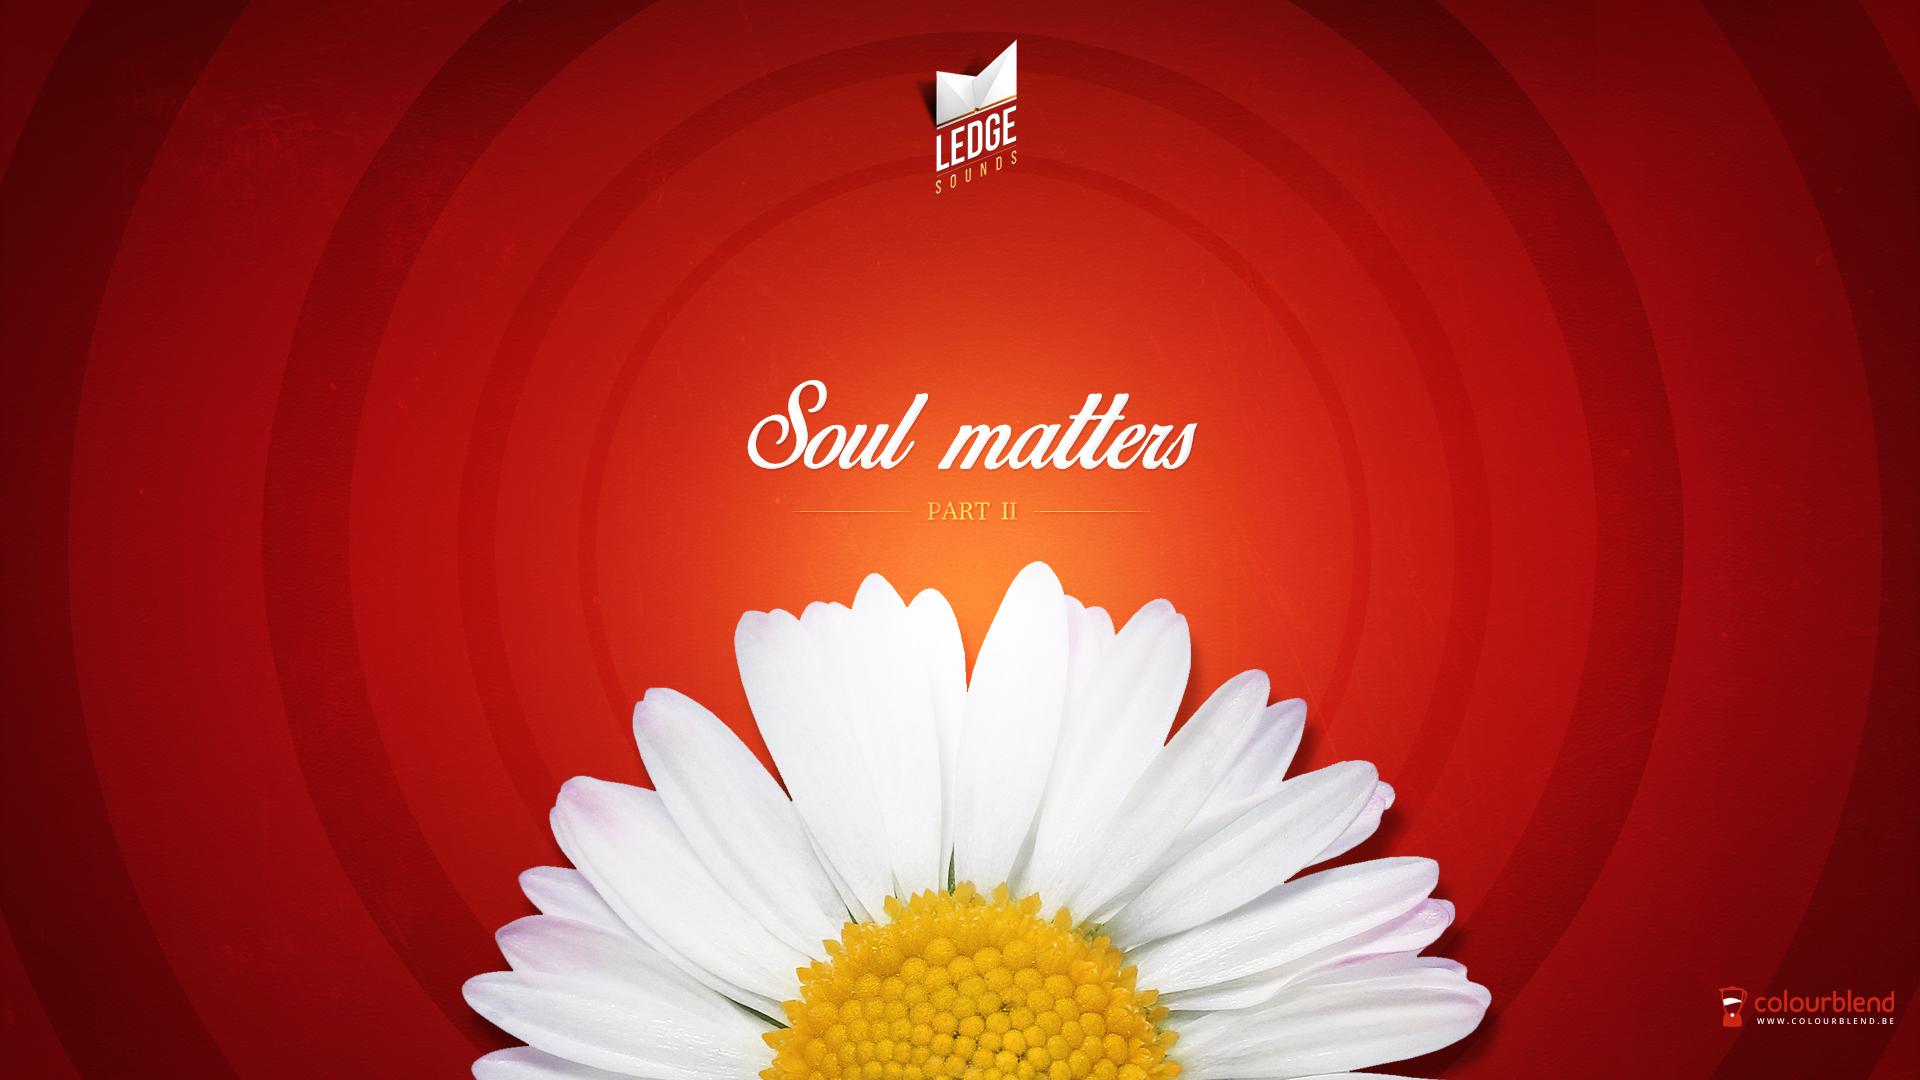 Soul Matters - Part 2 WPP by Robke22